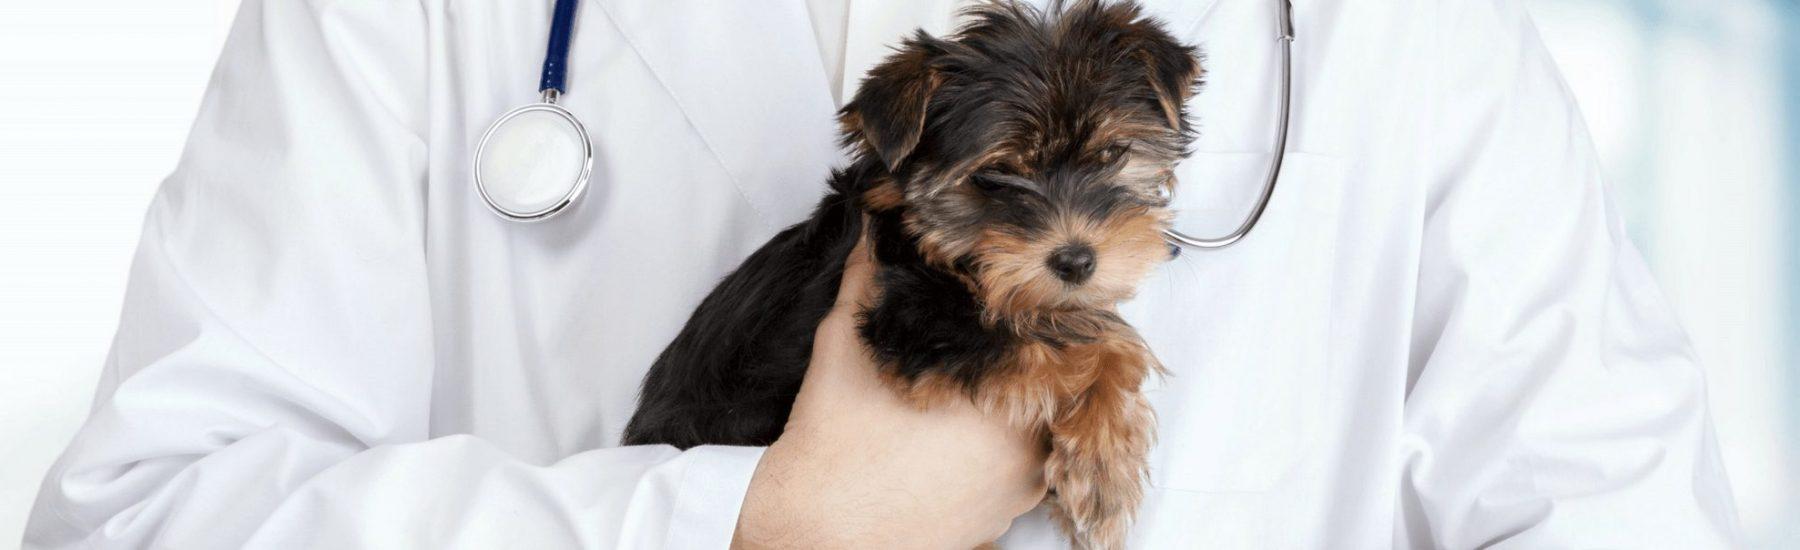 Cute puppy behind held by a vet